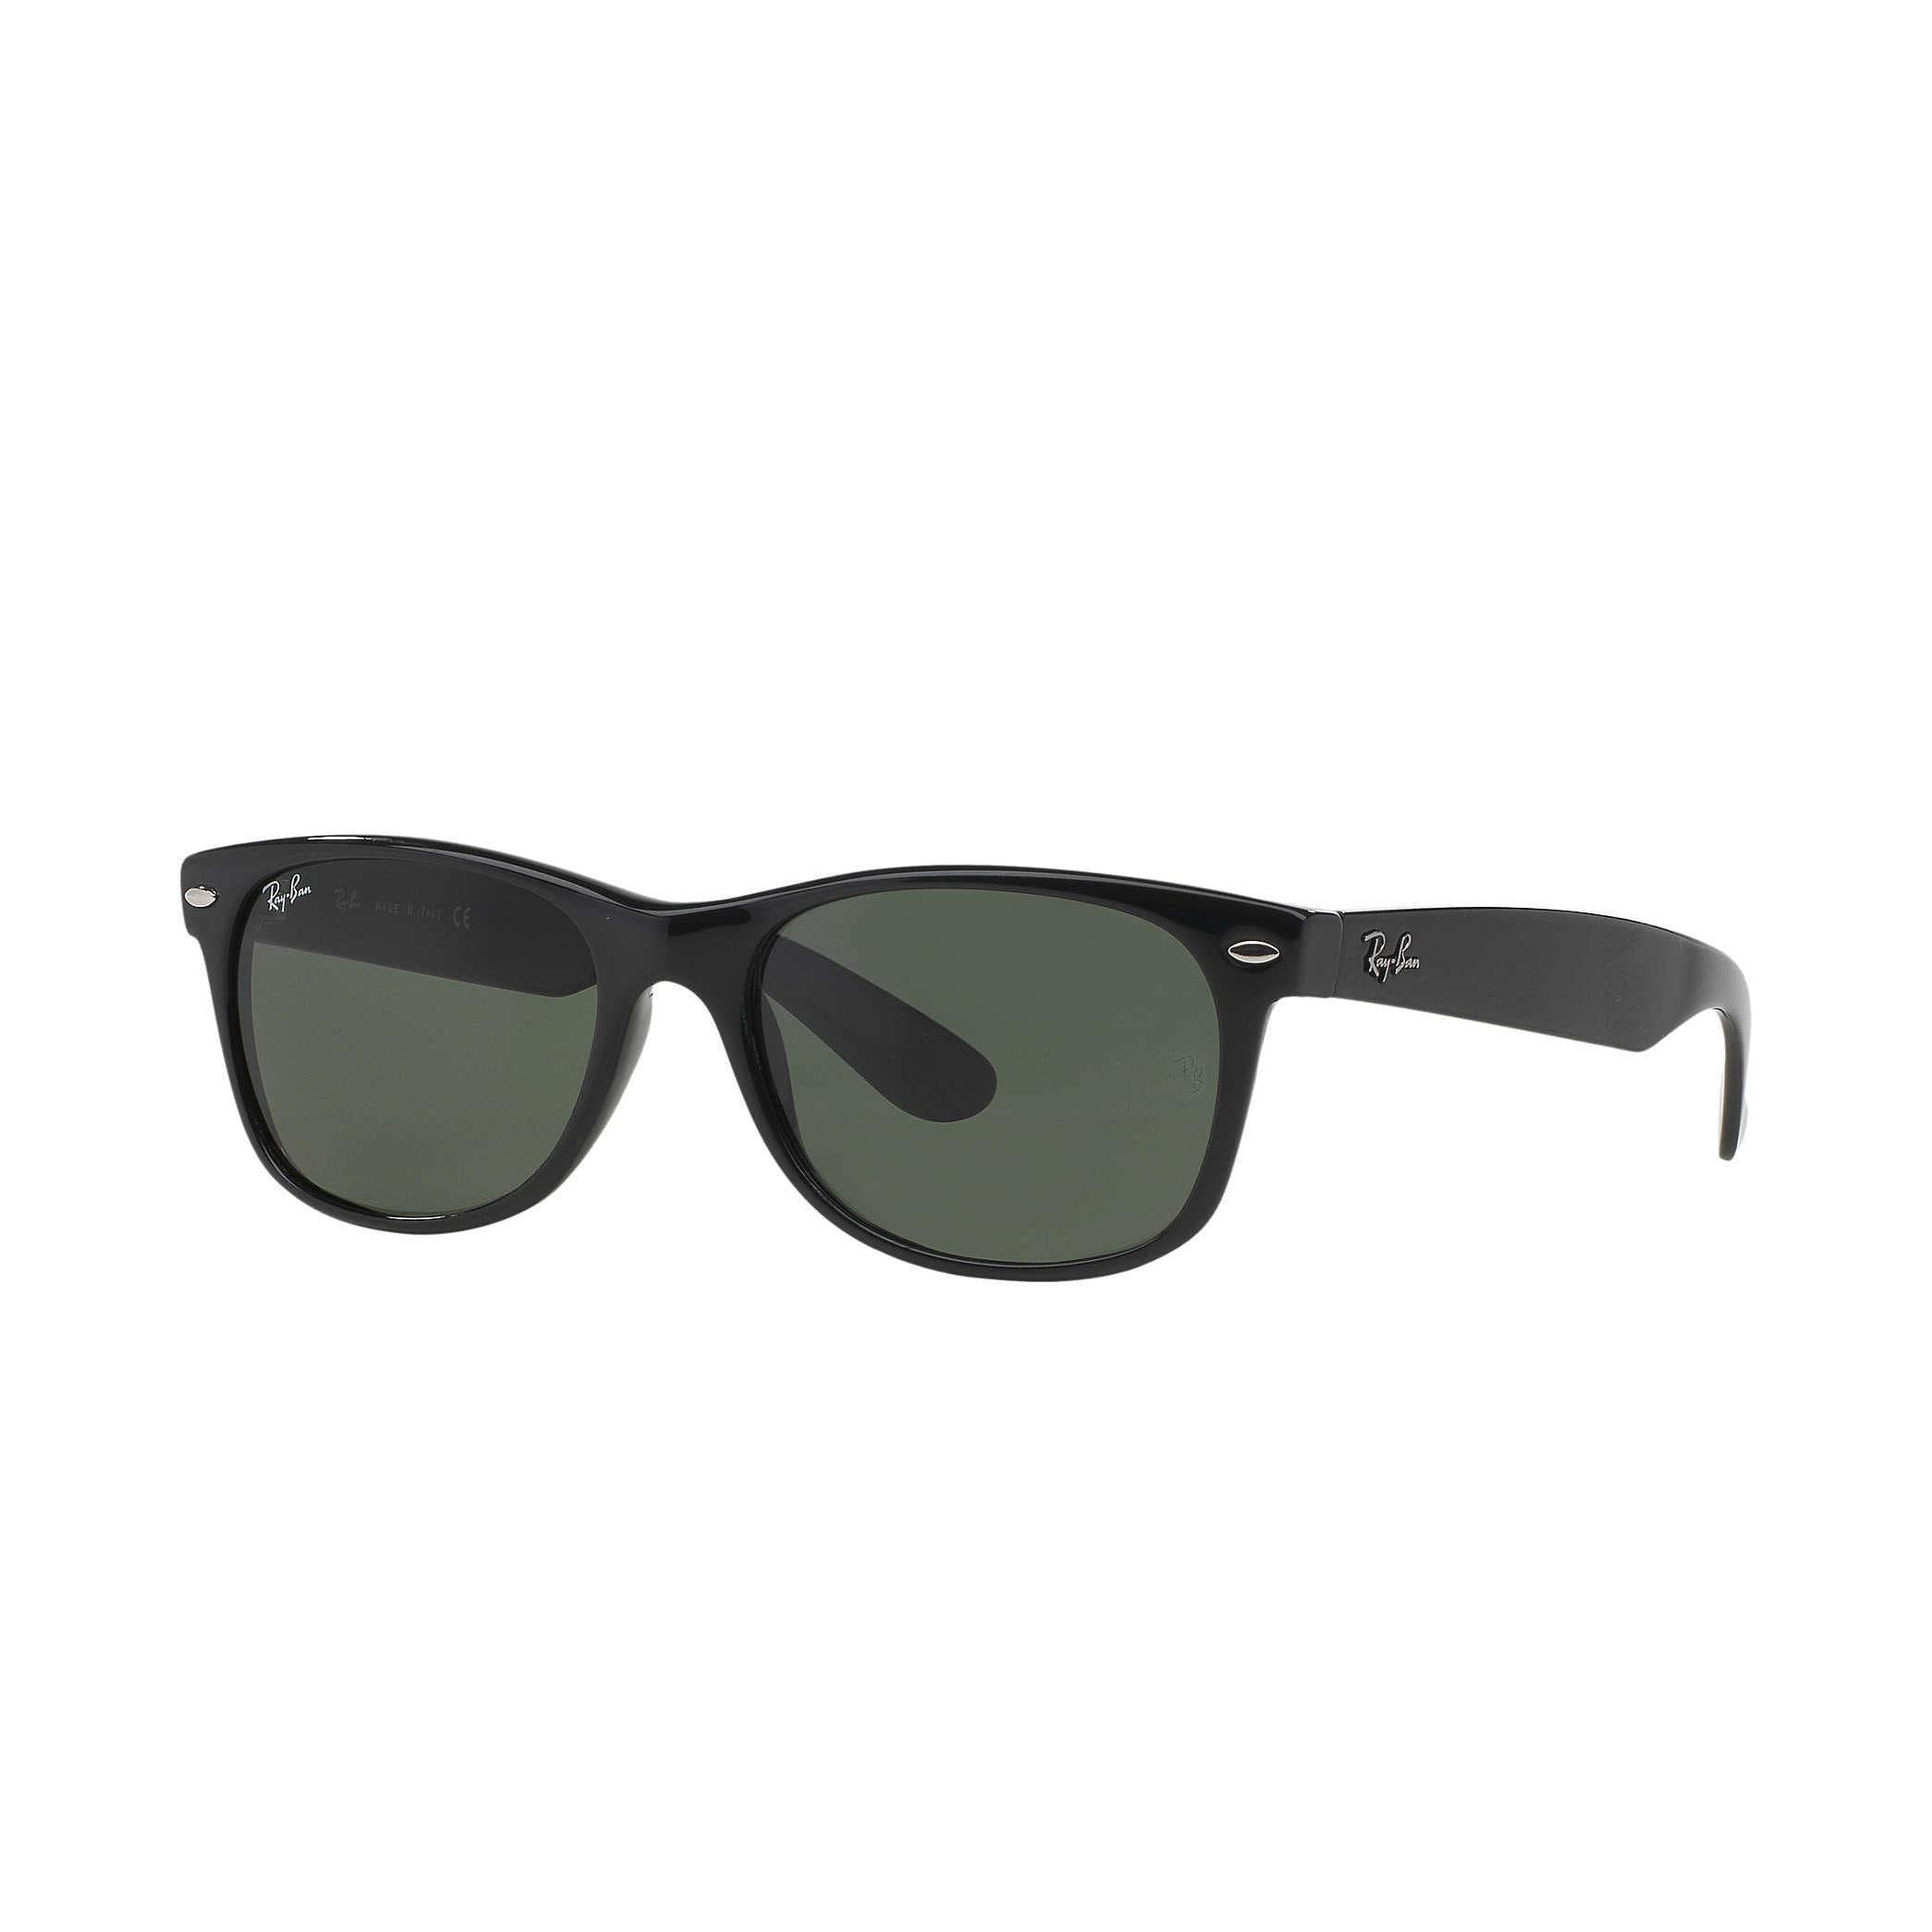 dc7eda8bb Shop Ray-Ban New Wayfarer RB 2132 Unisex 52 mm Sunglasses - Black ...